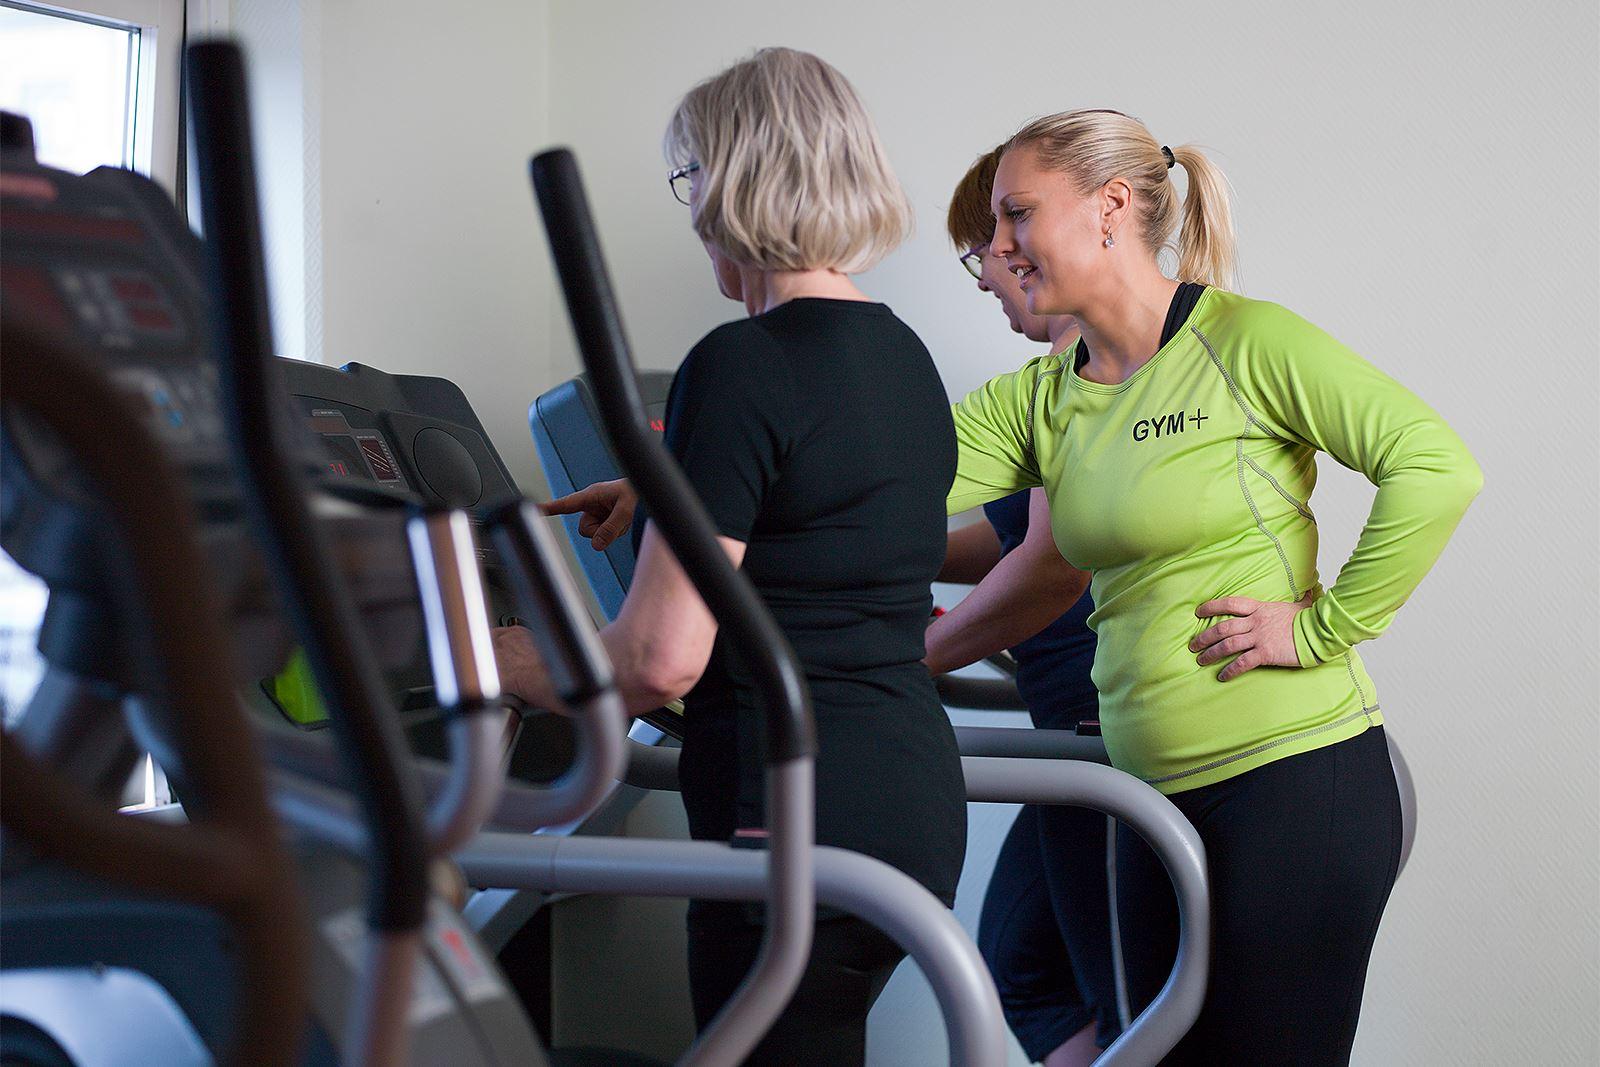 Anna Sköld, Gym+ - Anna hjälper kunder